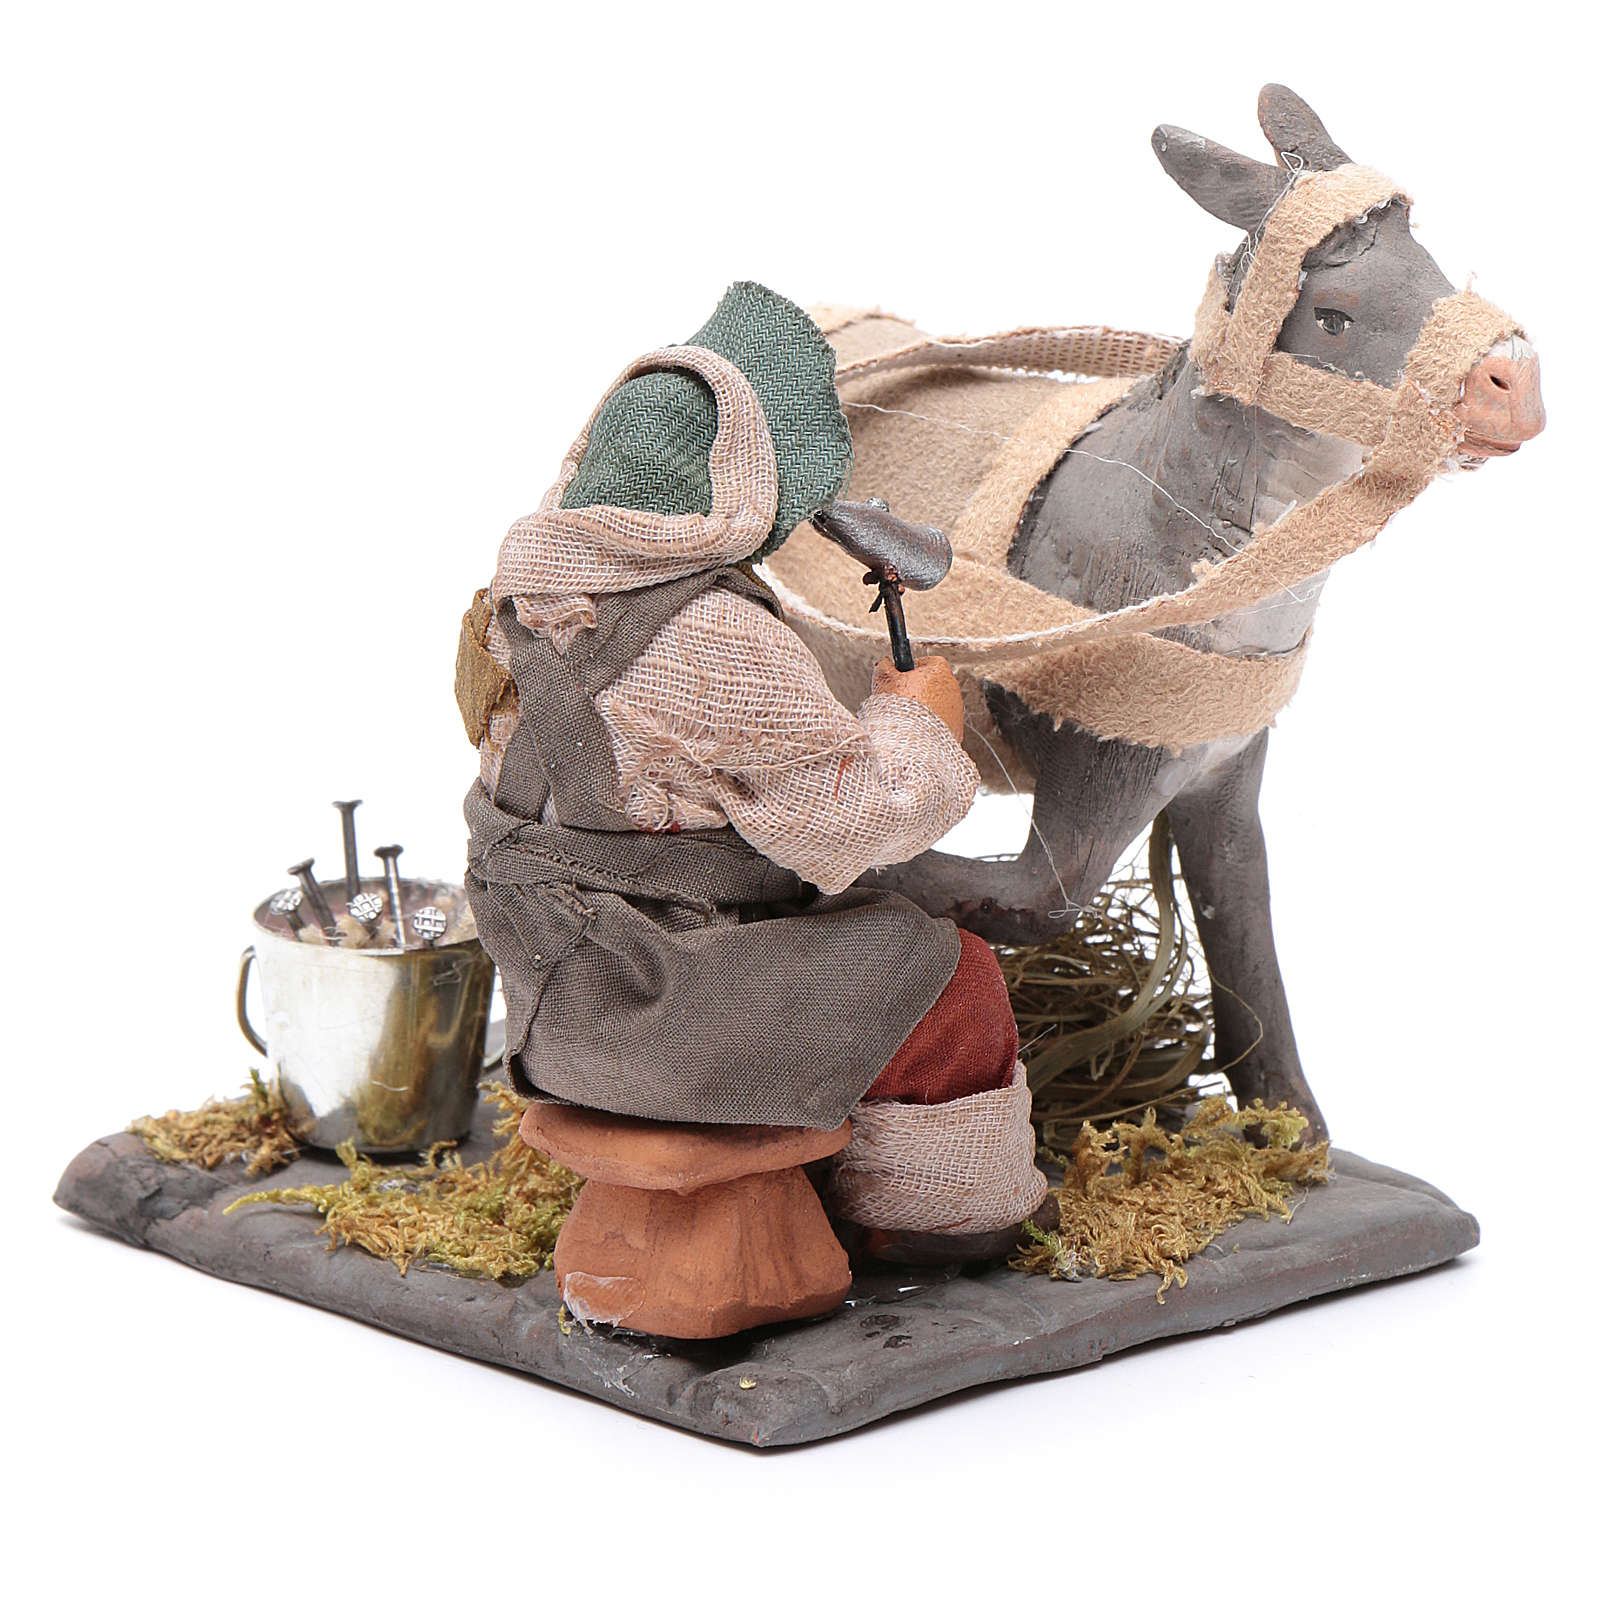 Neapolitan Nativity figurine, horseshoer, 10 cm 4